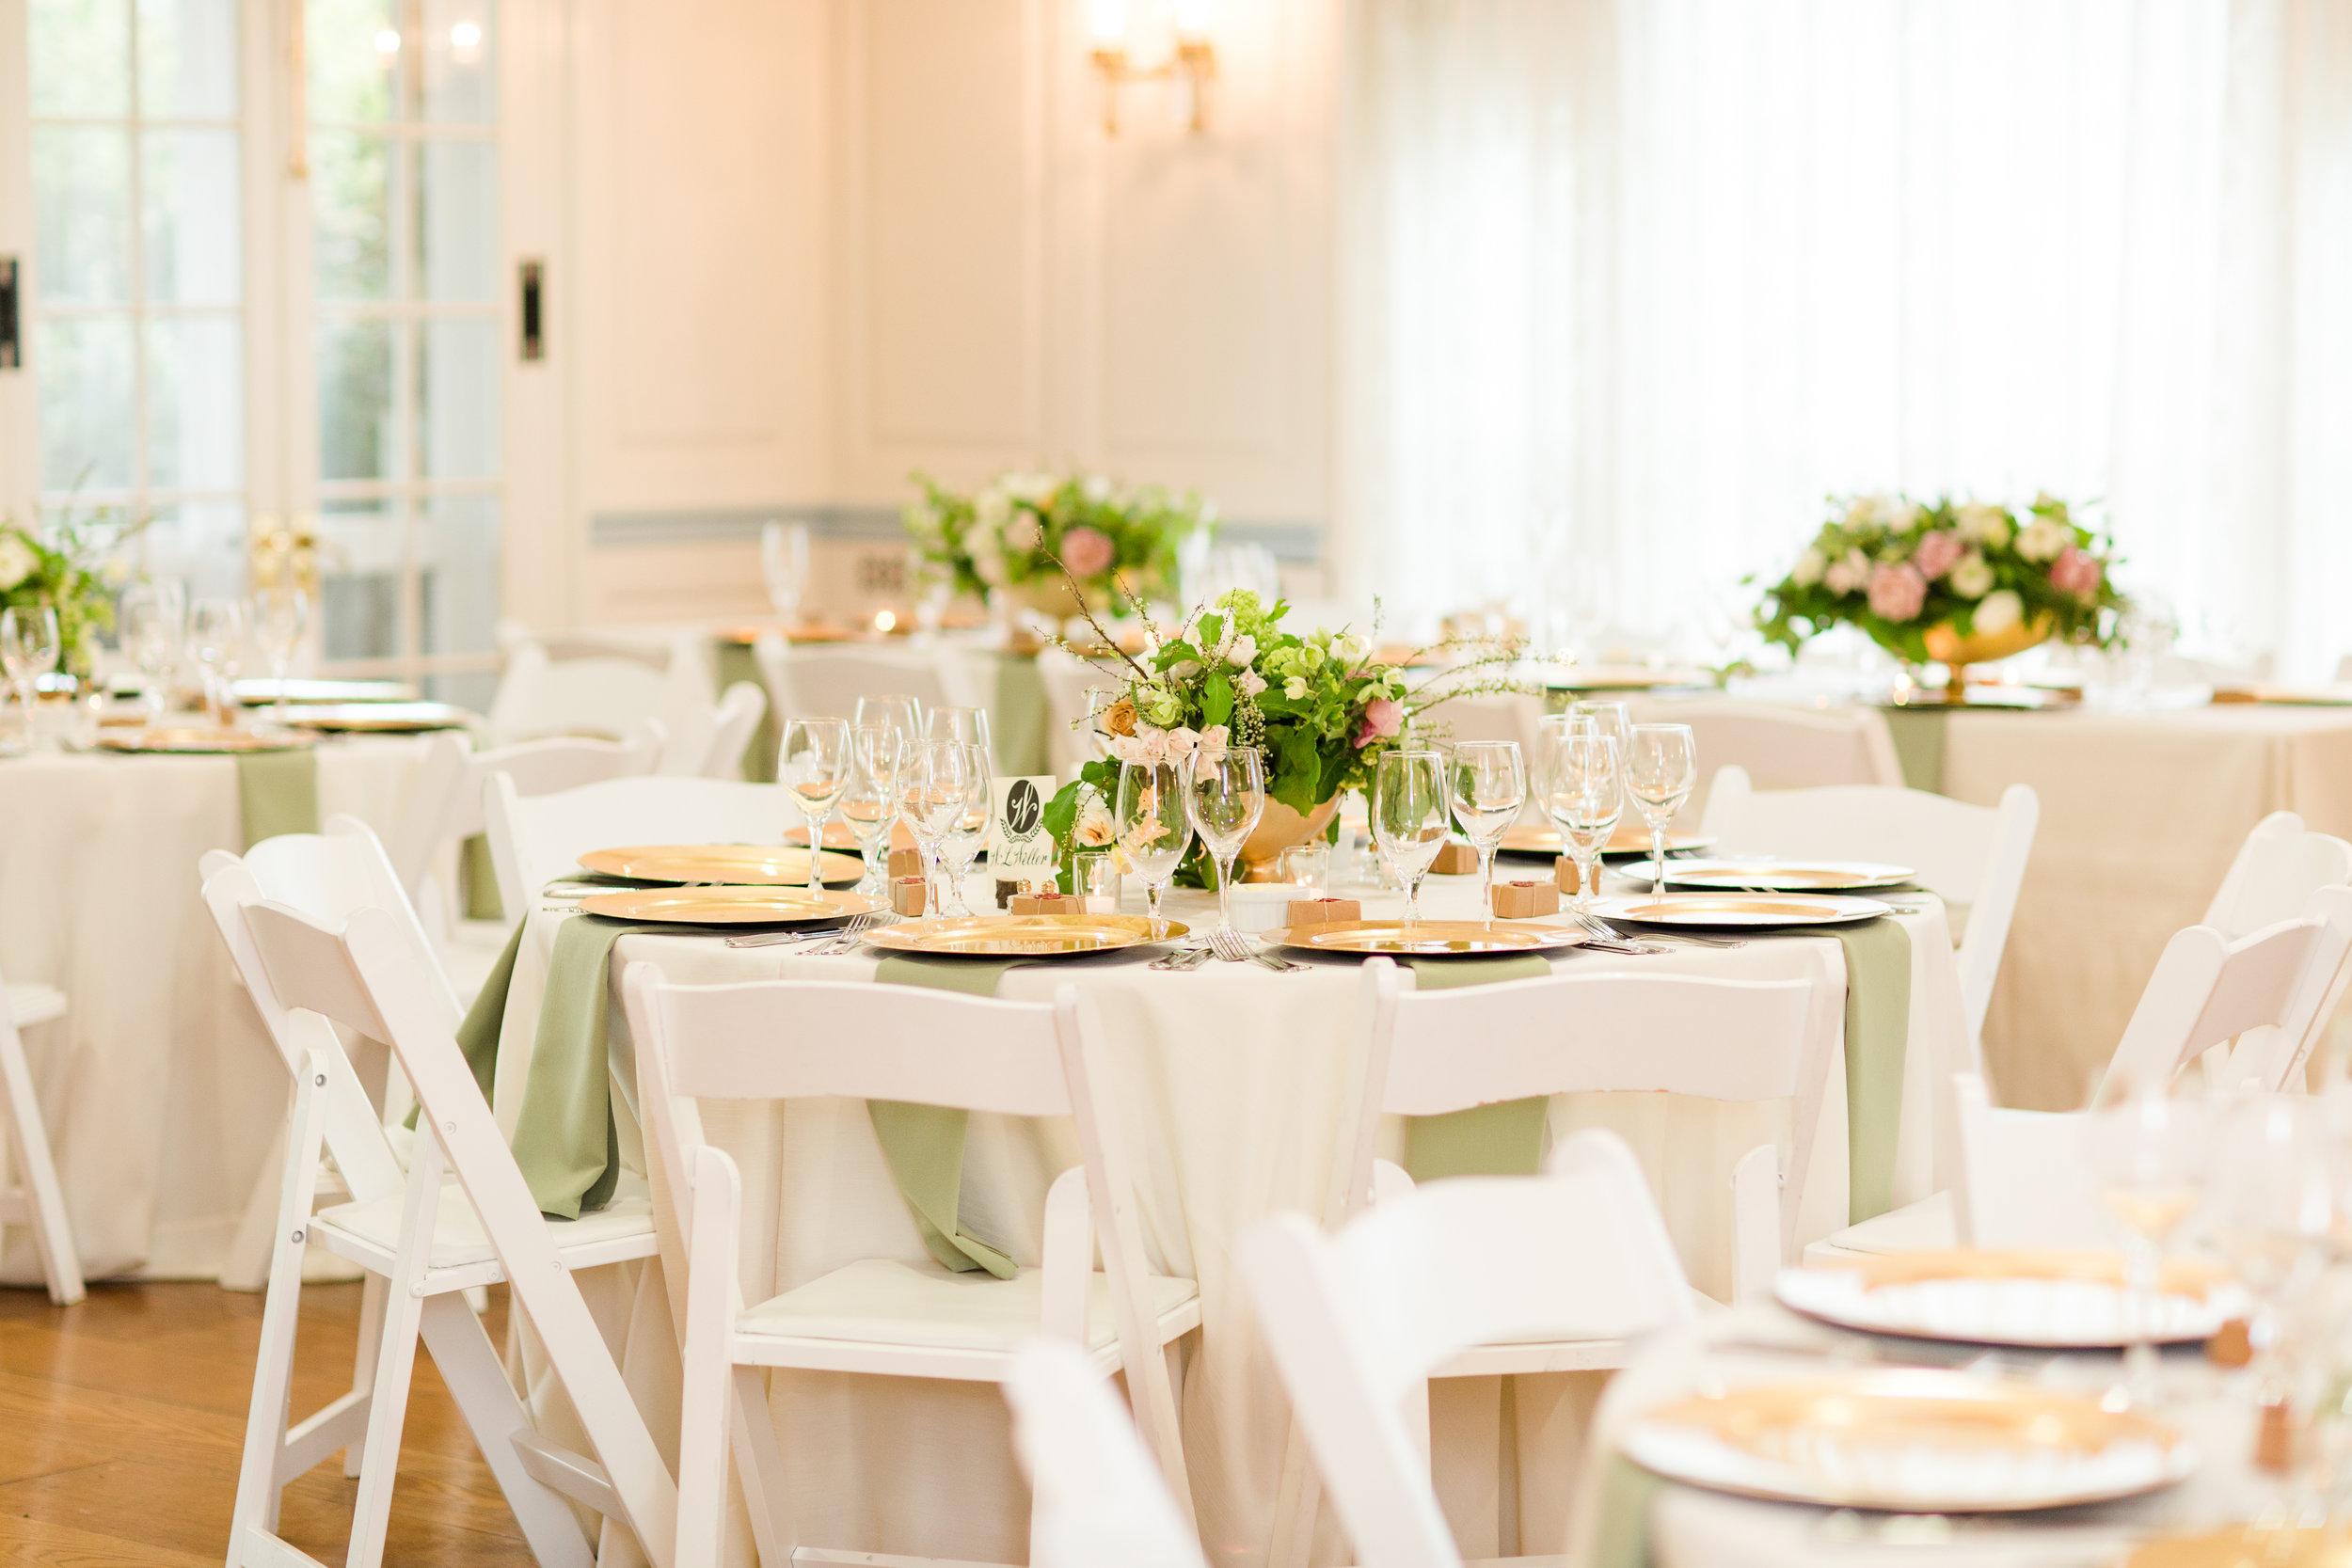 glenview-mansion-rockville-maryland-bourbon-derby-buker-wedding-reception-details-bethanne-arthur-photography-photos-57.jpg